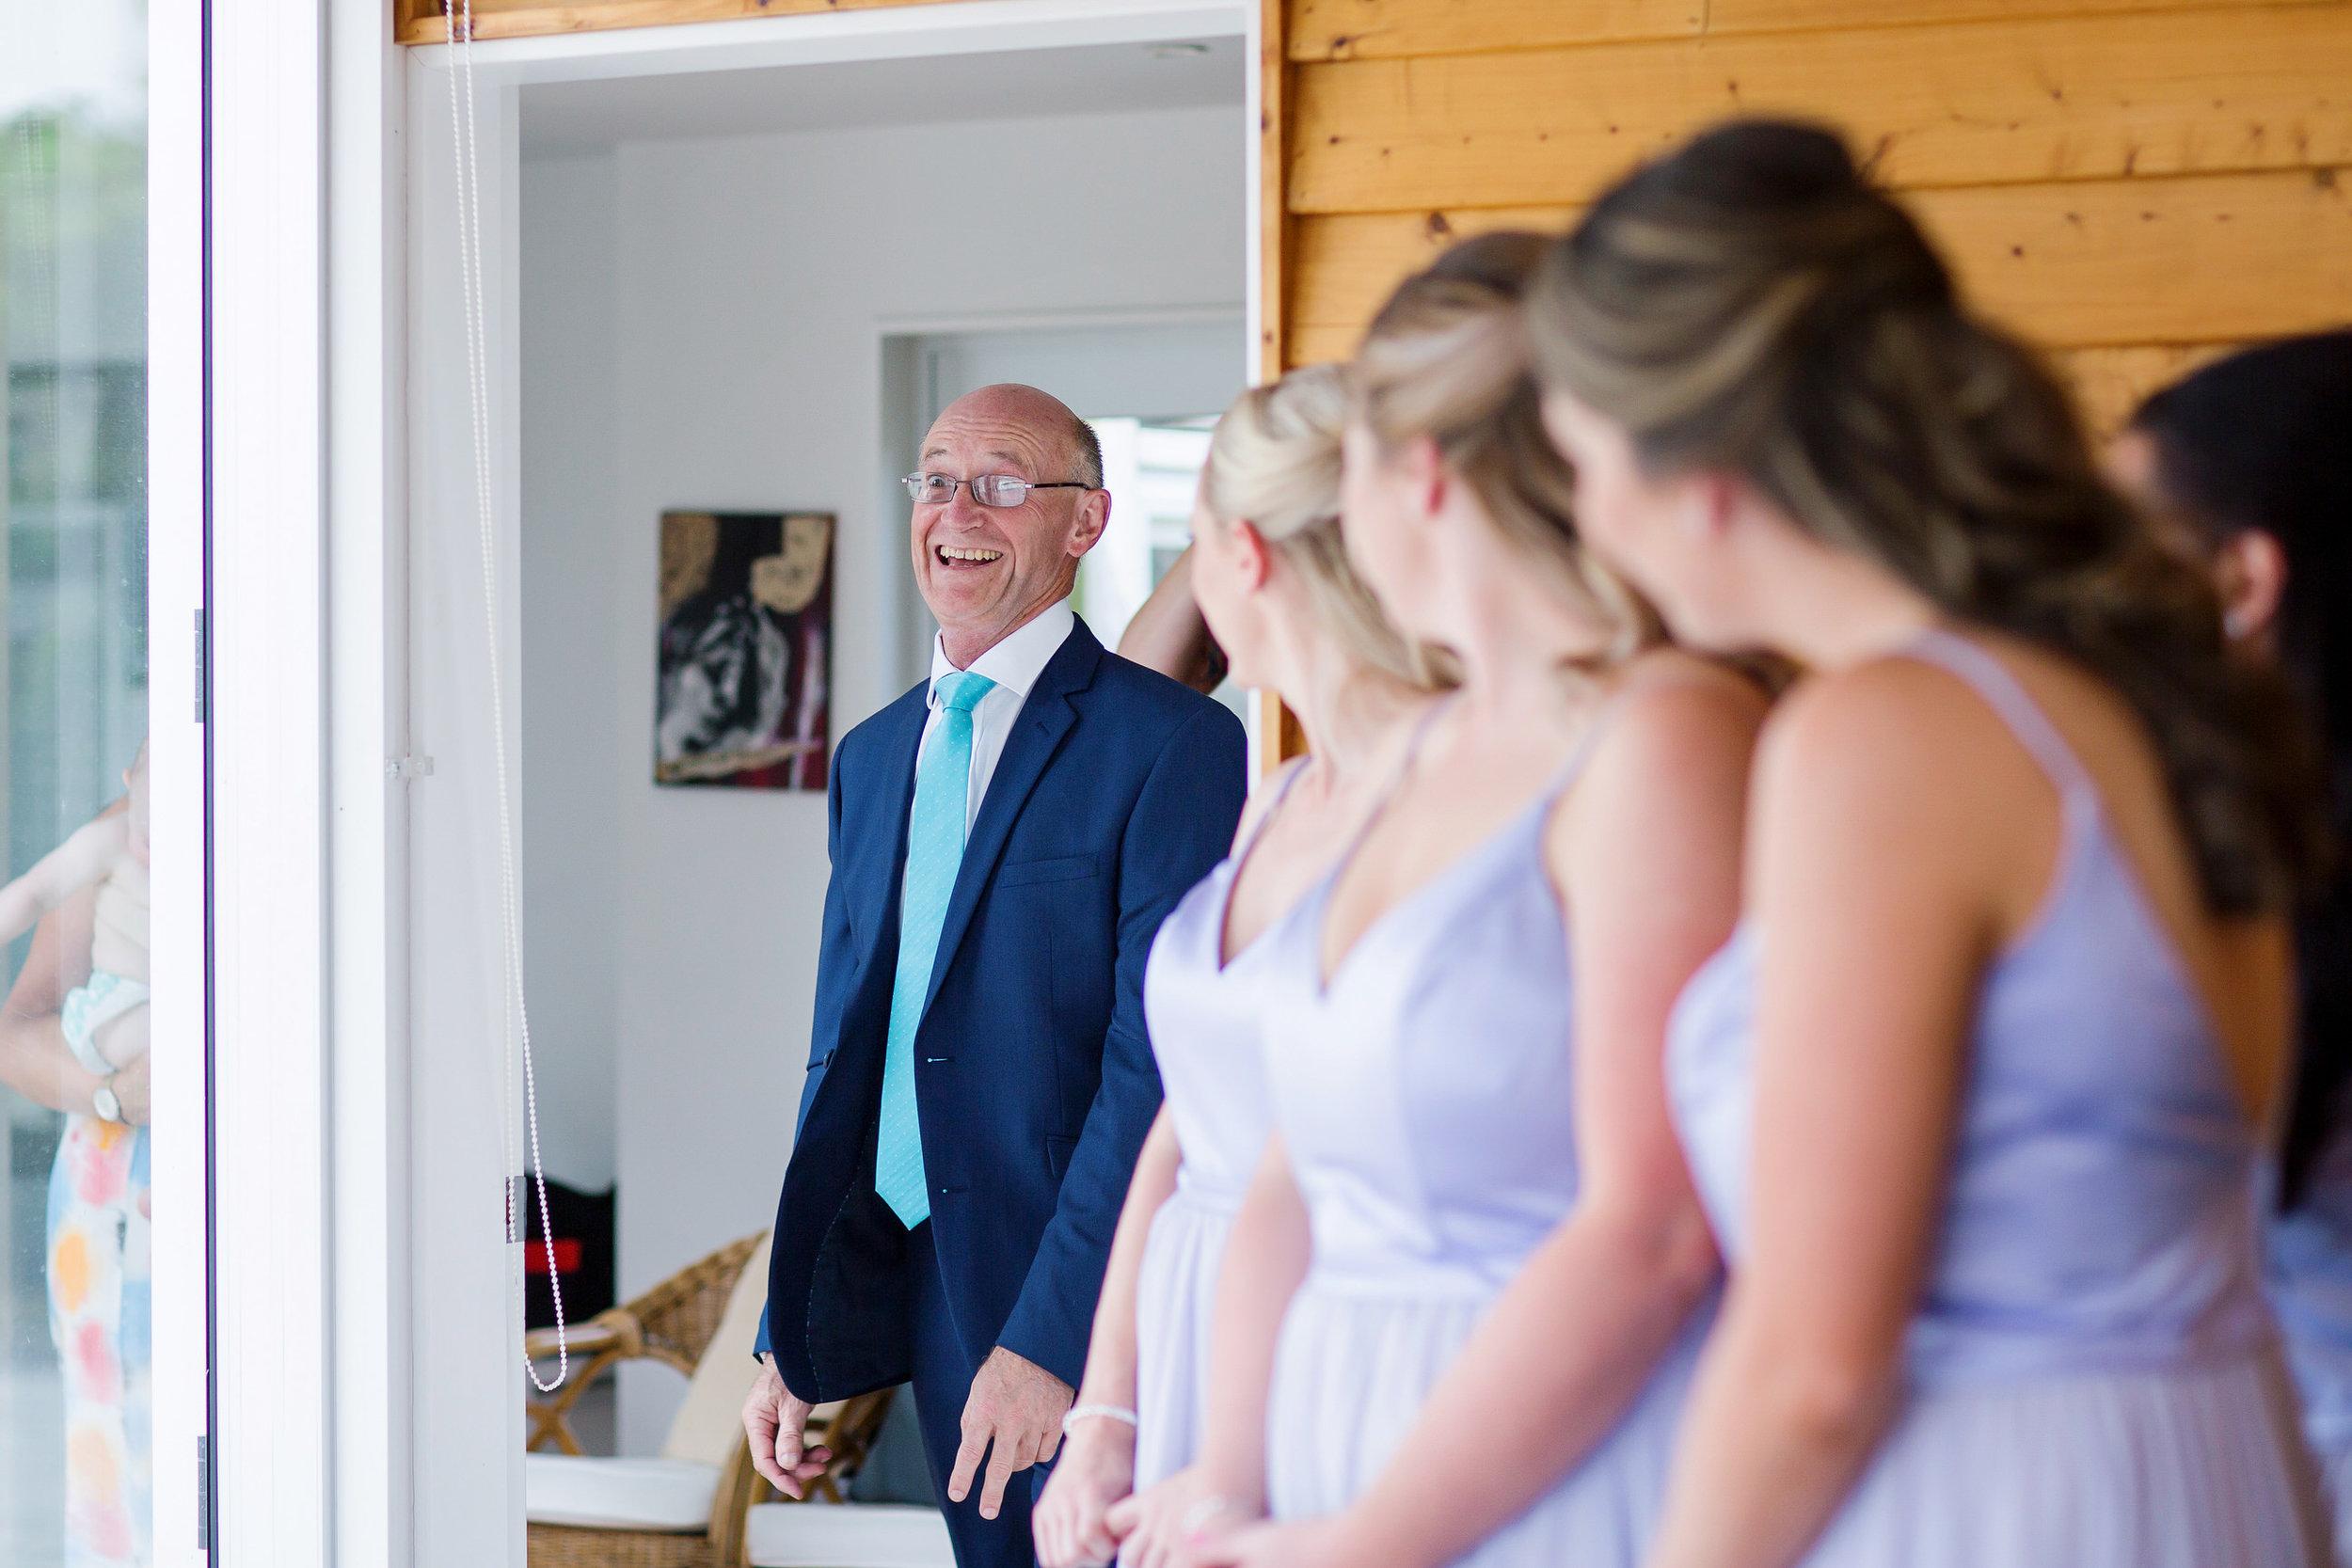 Martinborough-Poppies-Wedding-Caine-Eloise-Toni-Larsen-0033.jpg